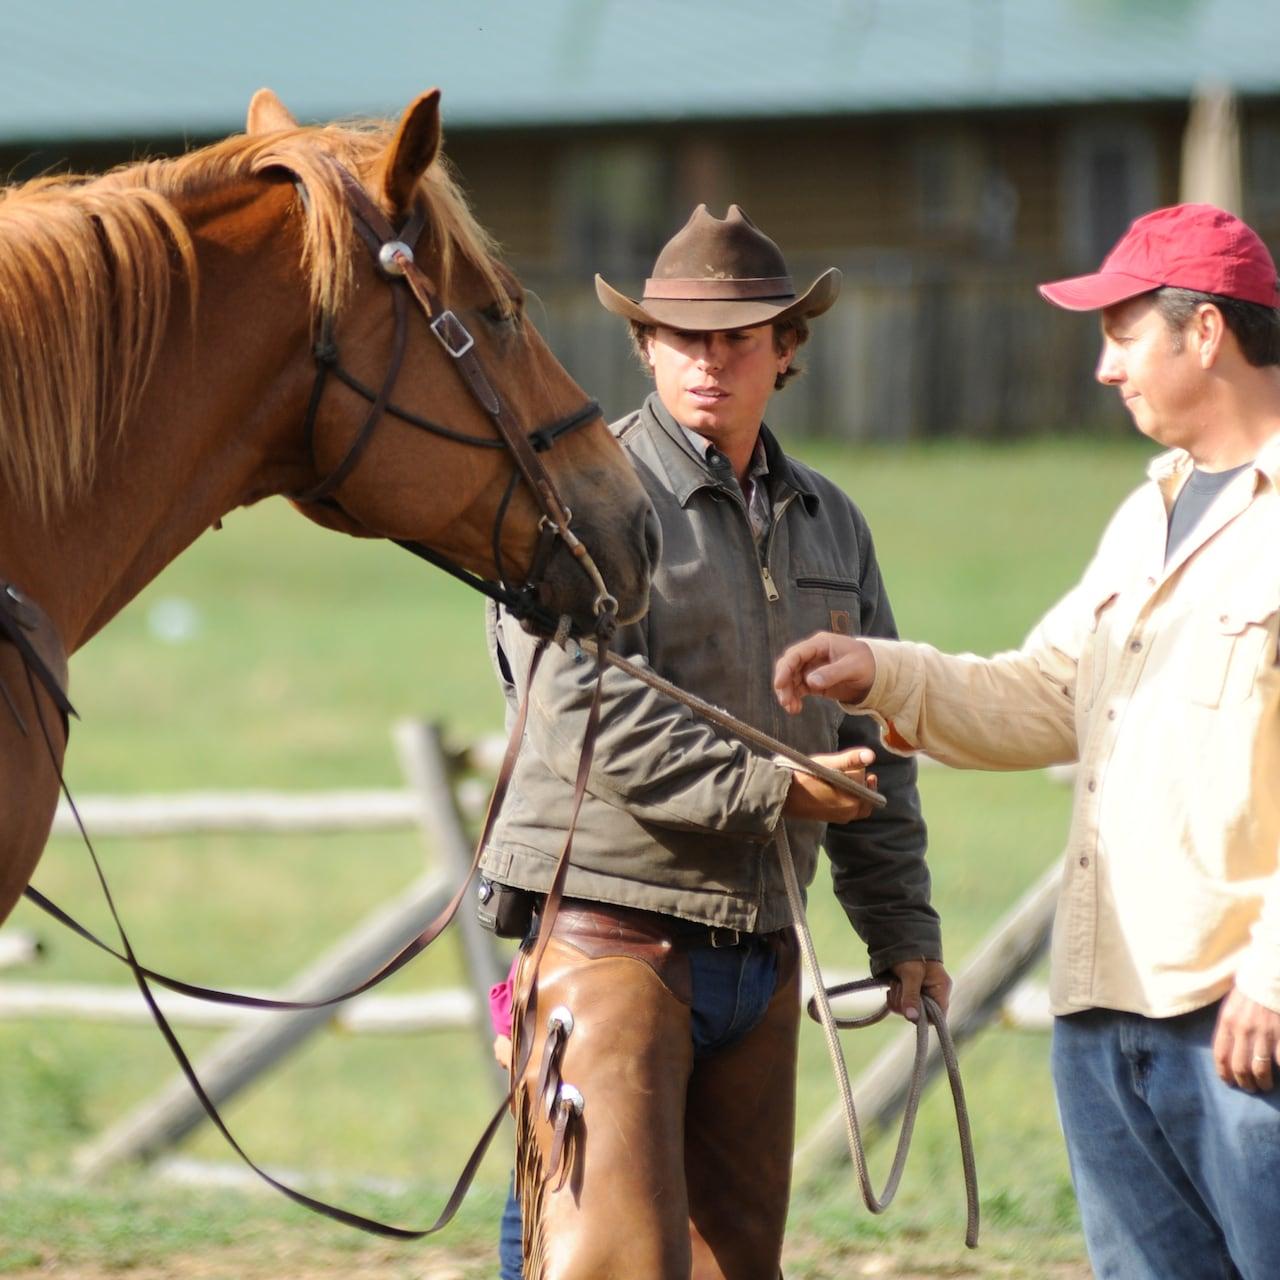 A cowboy hands a Guest the reins of a horse